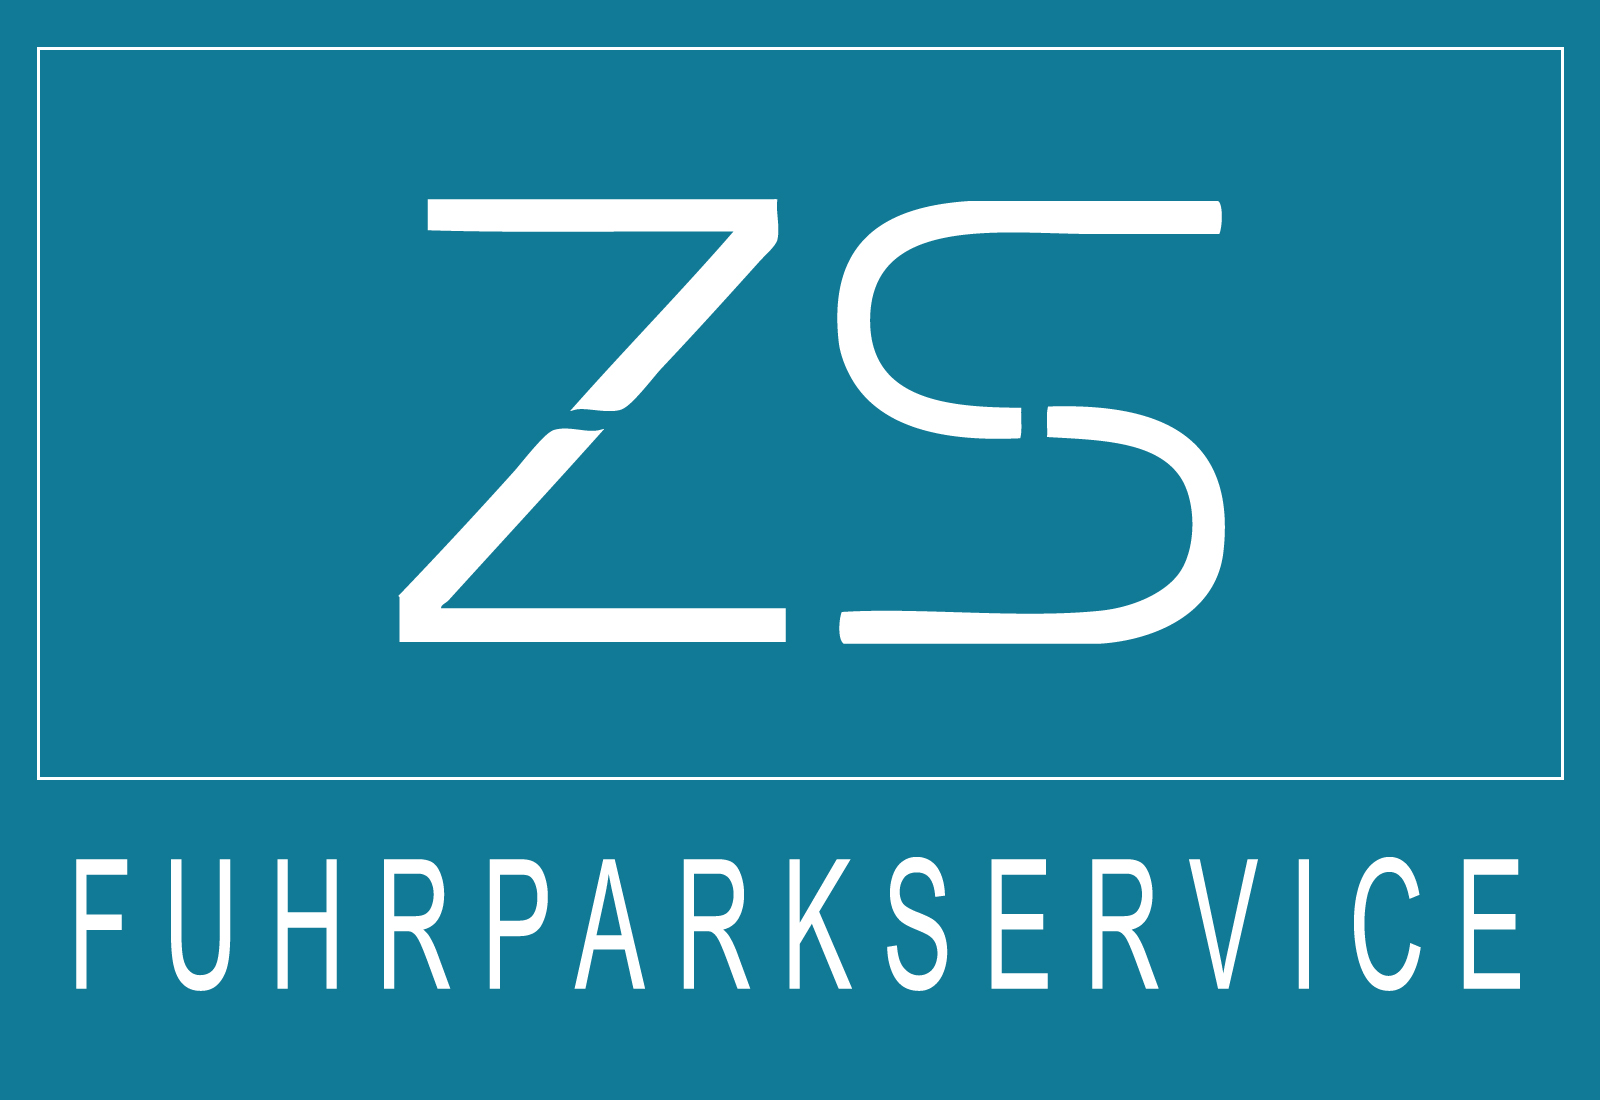 ZS Fuhrparkservice GmbH